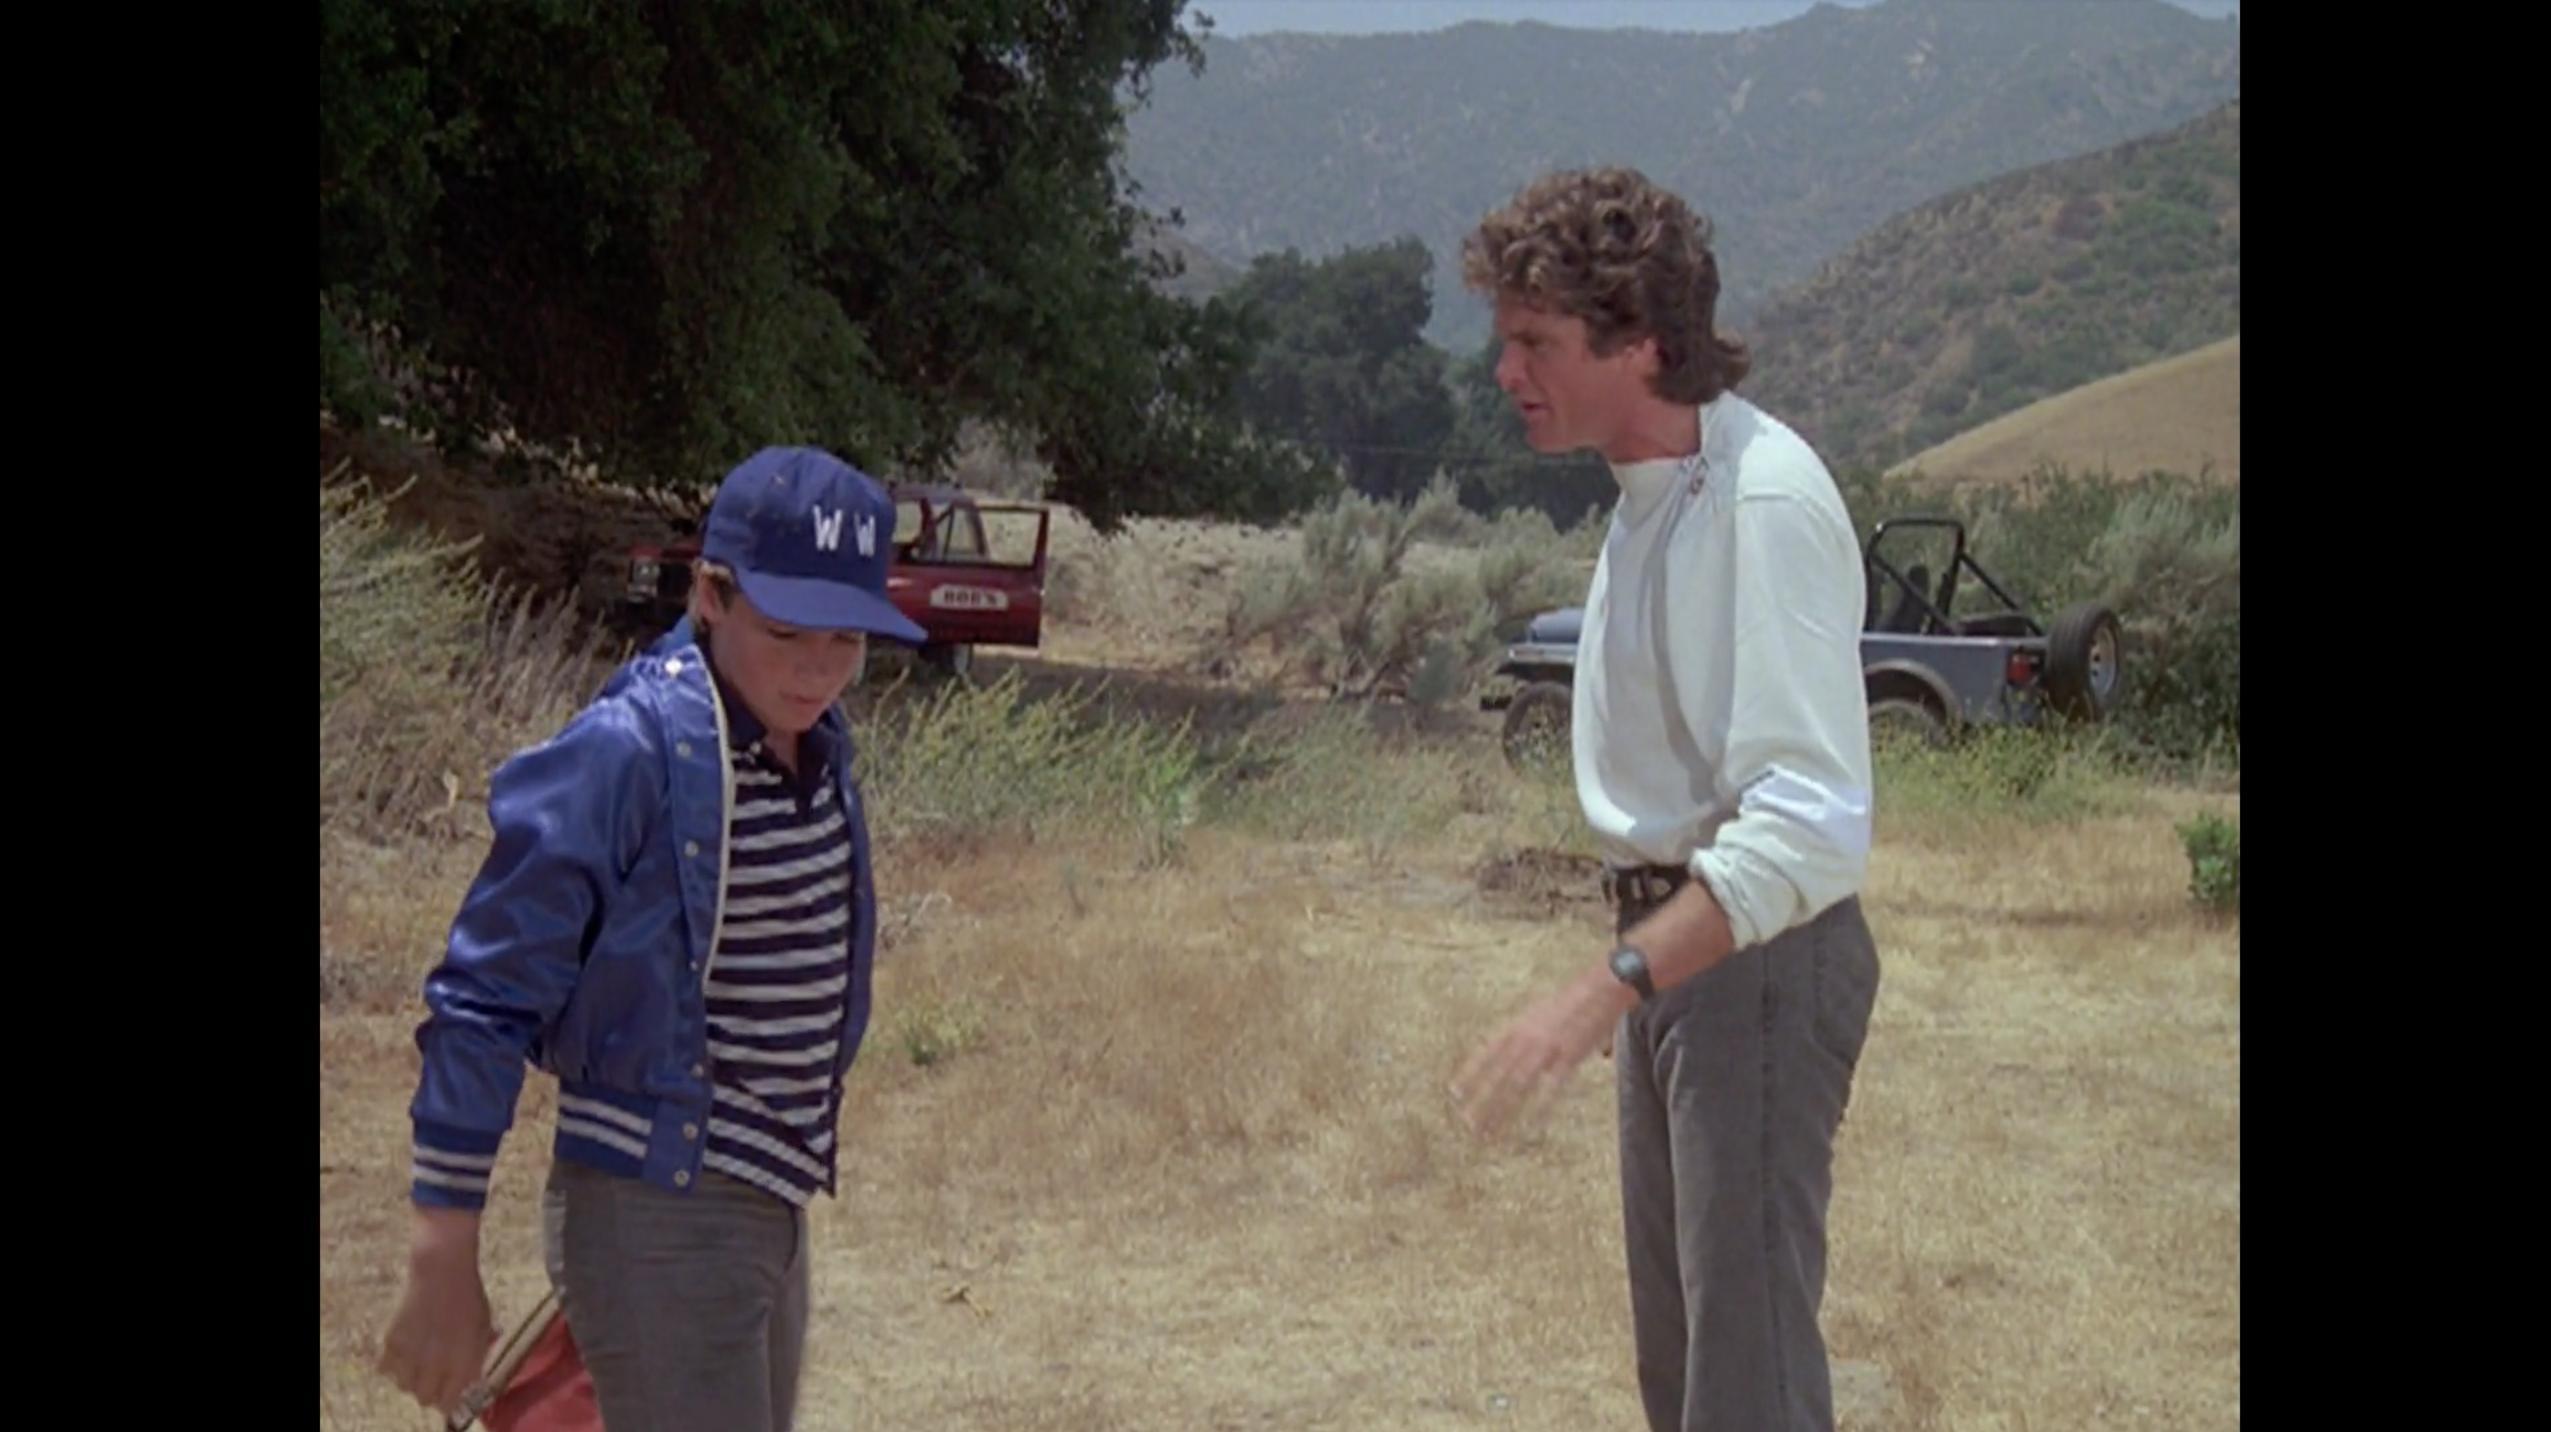 Jason Bateman and David Hasselhoff in Knight Rider (1982)